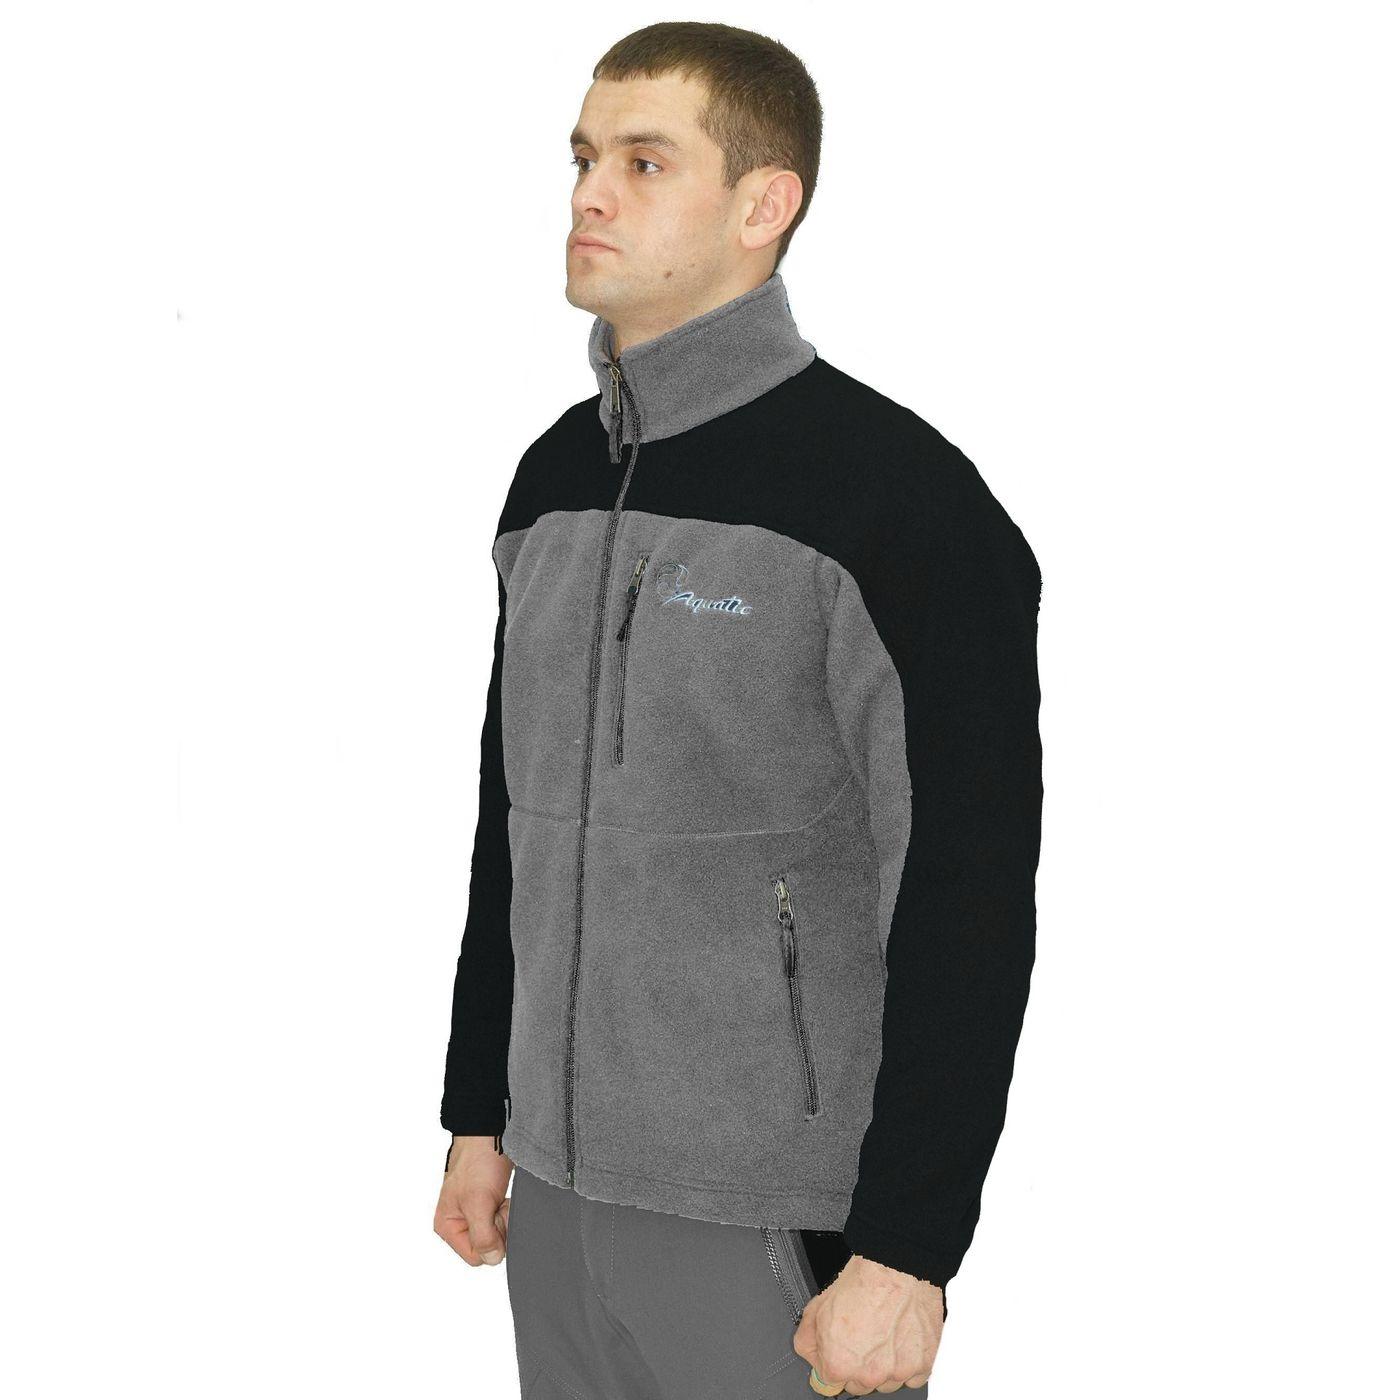 Fleece Jacket Aquatic кф-03 сh кф-03 сh XXXL